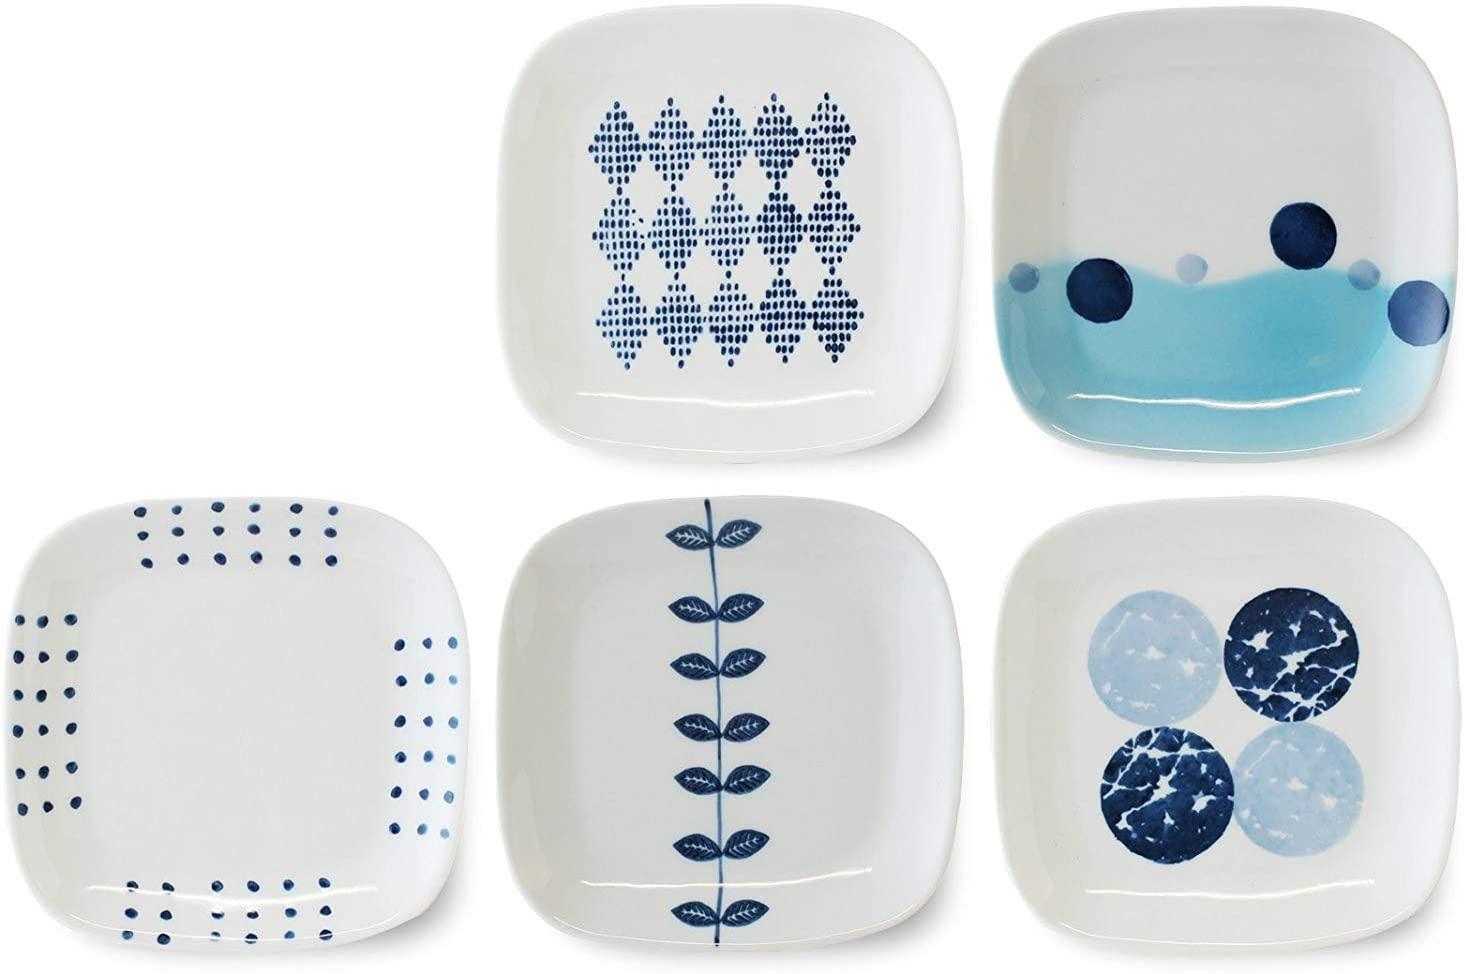 CtoCJAPAN Ceramic Plate Set (5pcs) 5.7 inch Premium Quality Porcelain Made in Japan No.915430